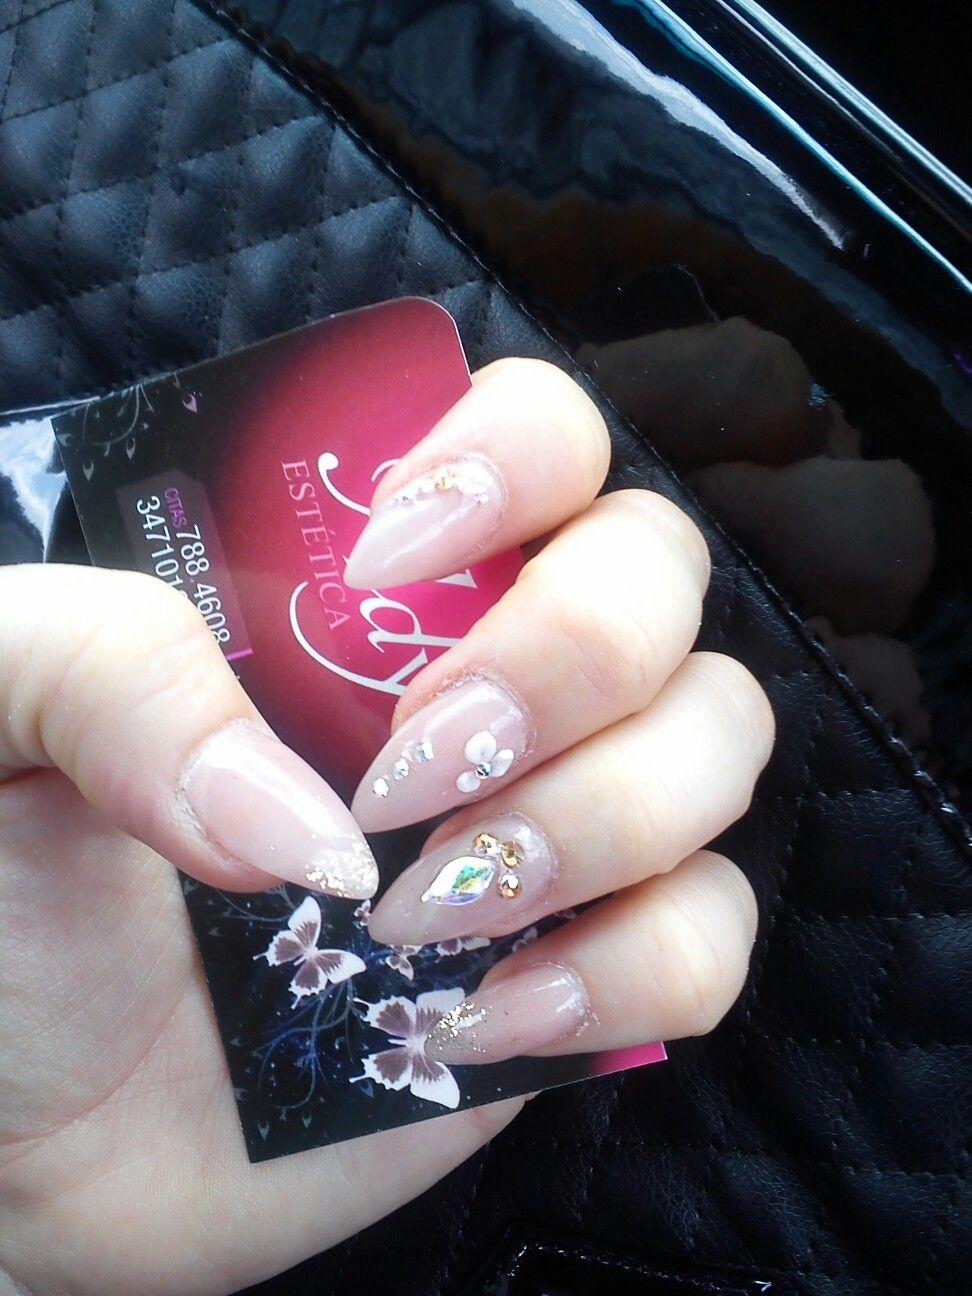 Pin by ady on uñas ady nails Pinterest